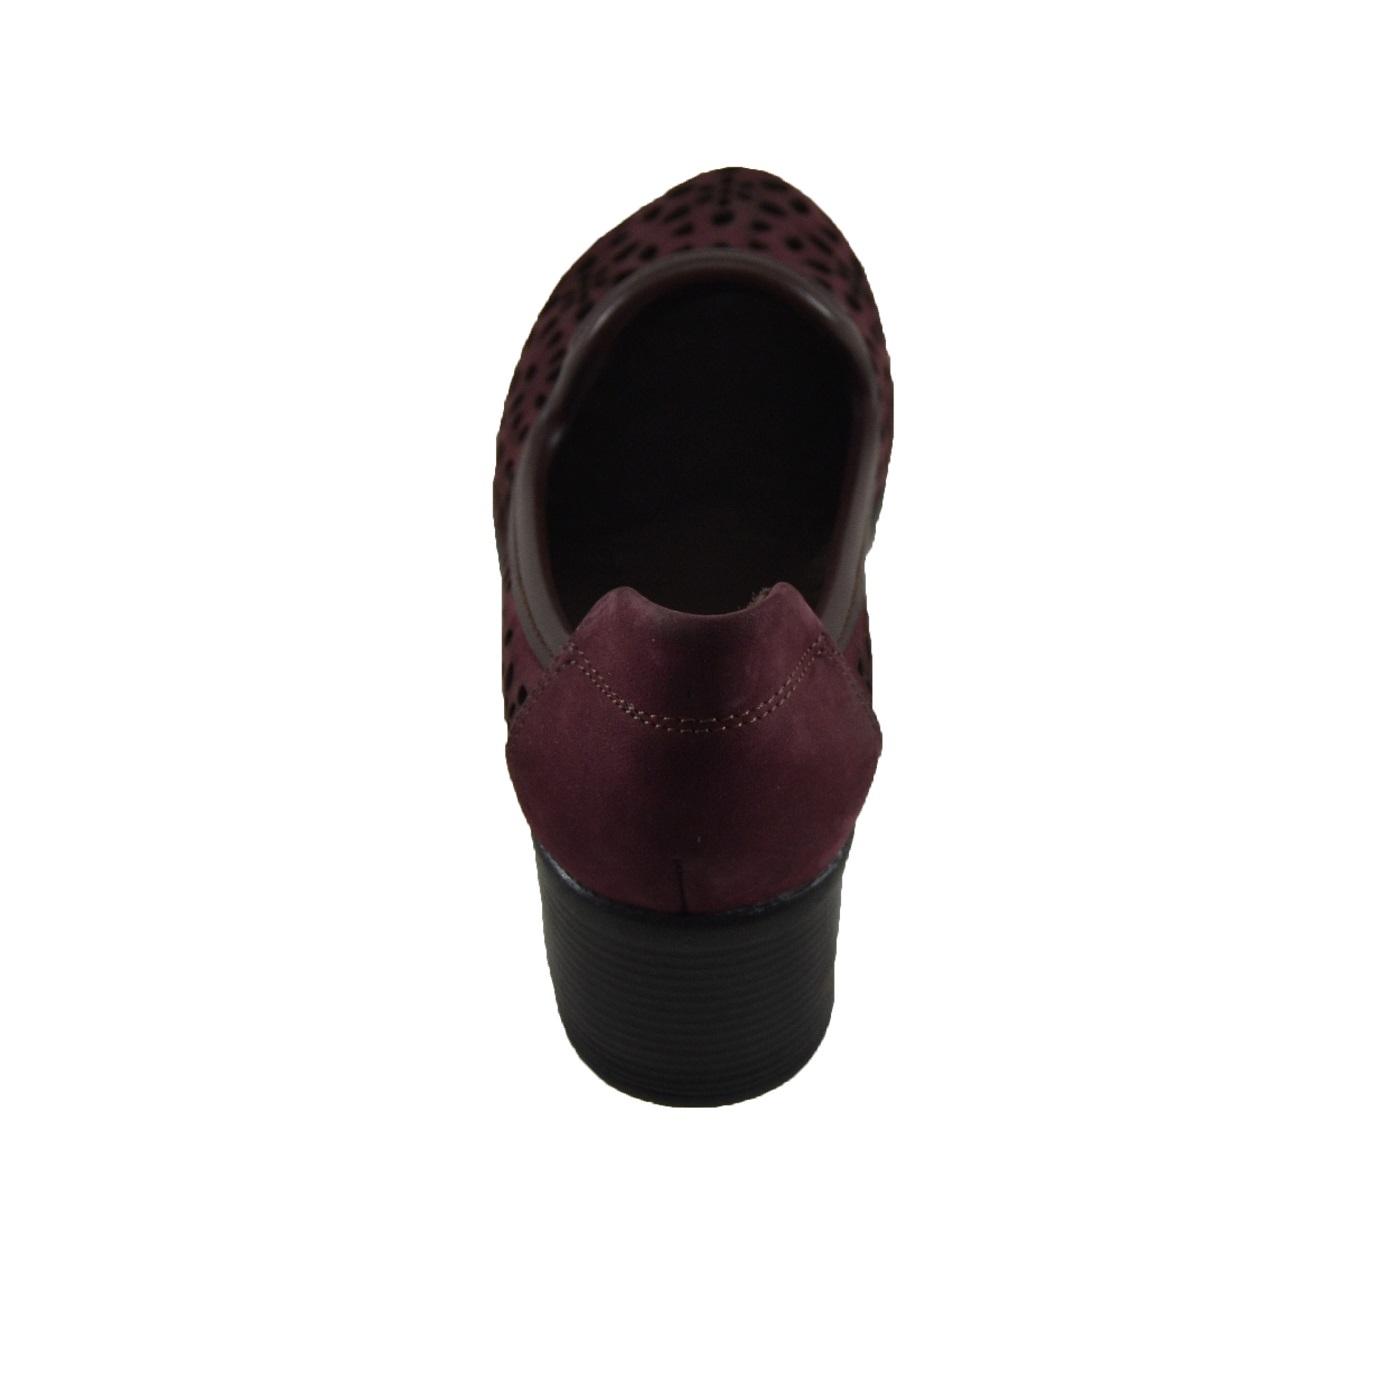 کفش زنانه کد 456 -  - 5